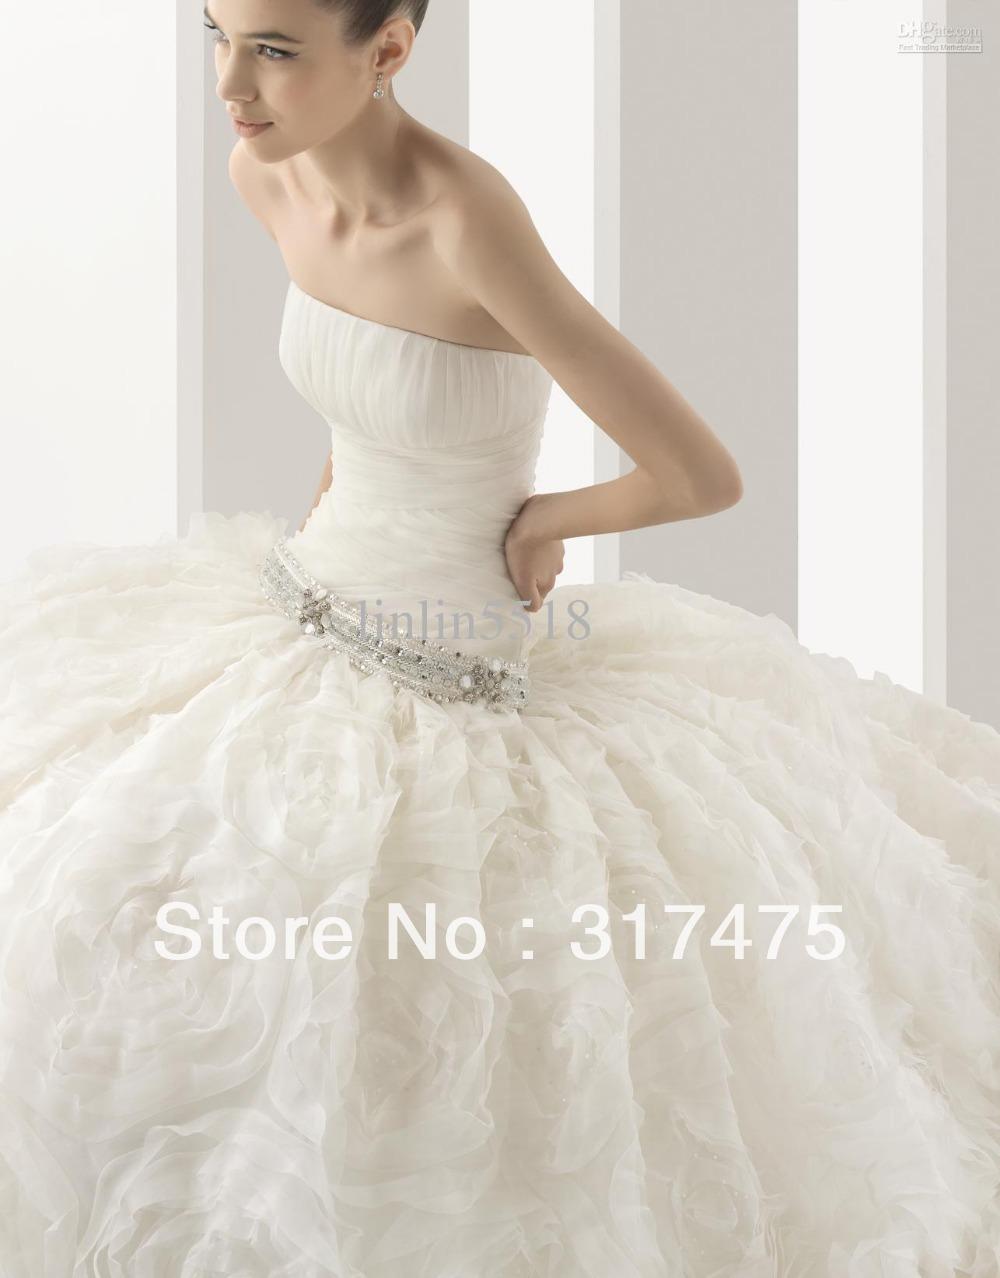 Fall-Hochzeitskleid Farben